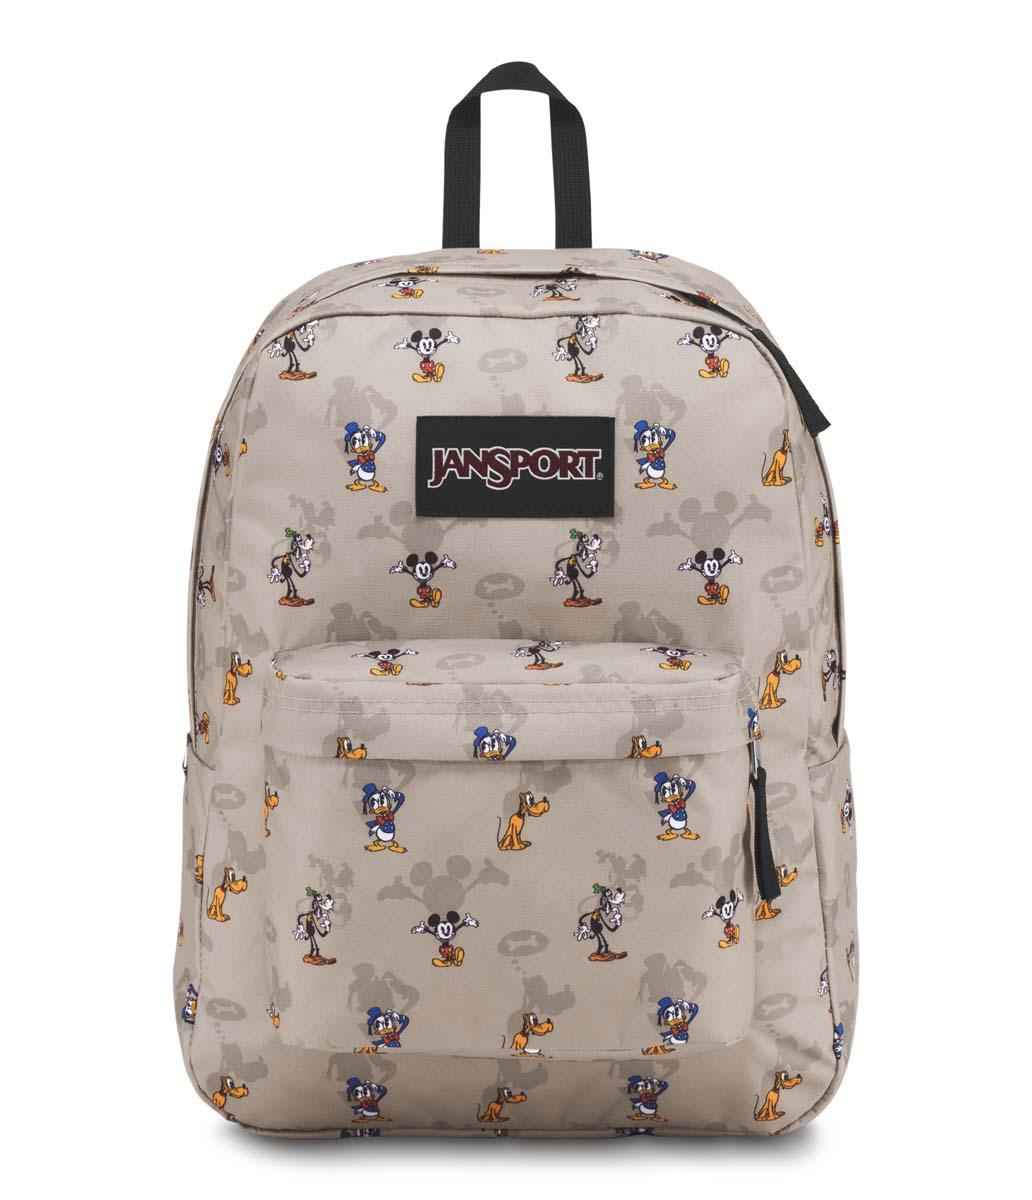 JanSport กระเป๋าเป้ รุ่น Superbreak - Disney Fab Shadow